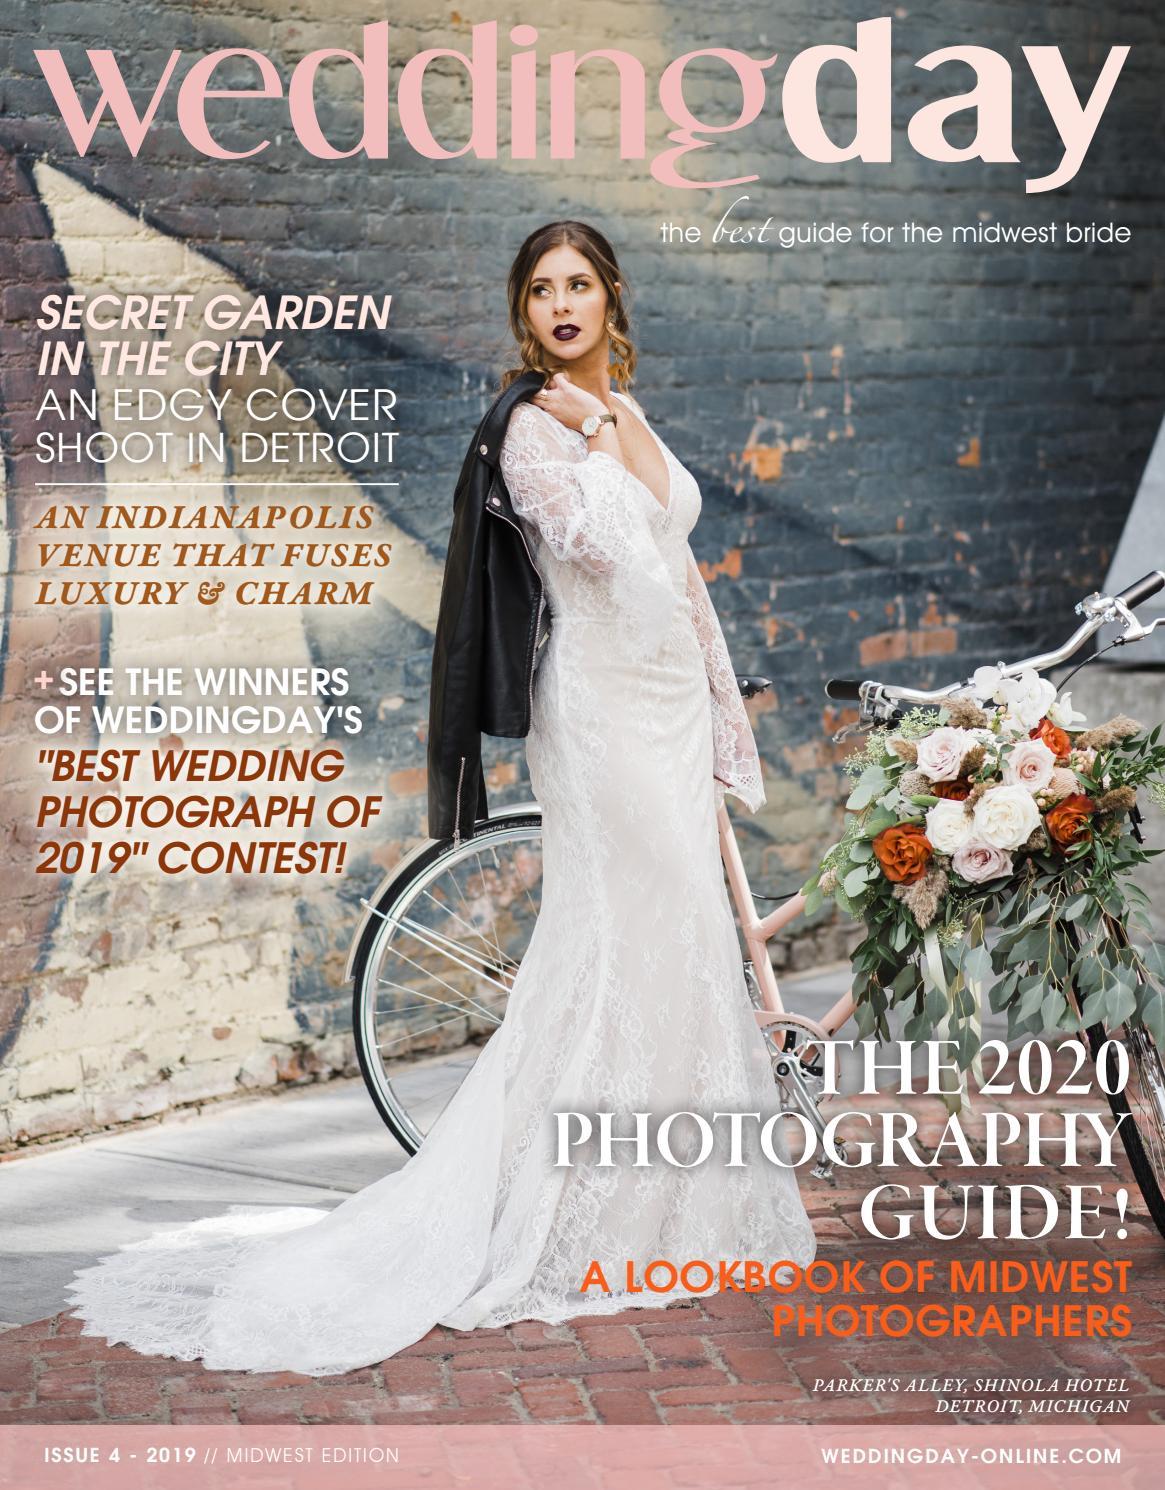 Weddingday Magazine Issue 4 2019 By Life Events Media Issuu